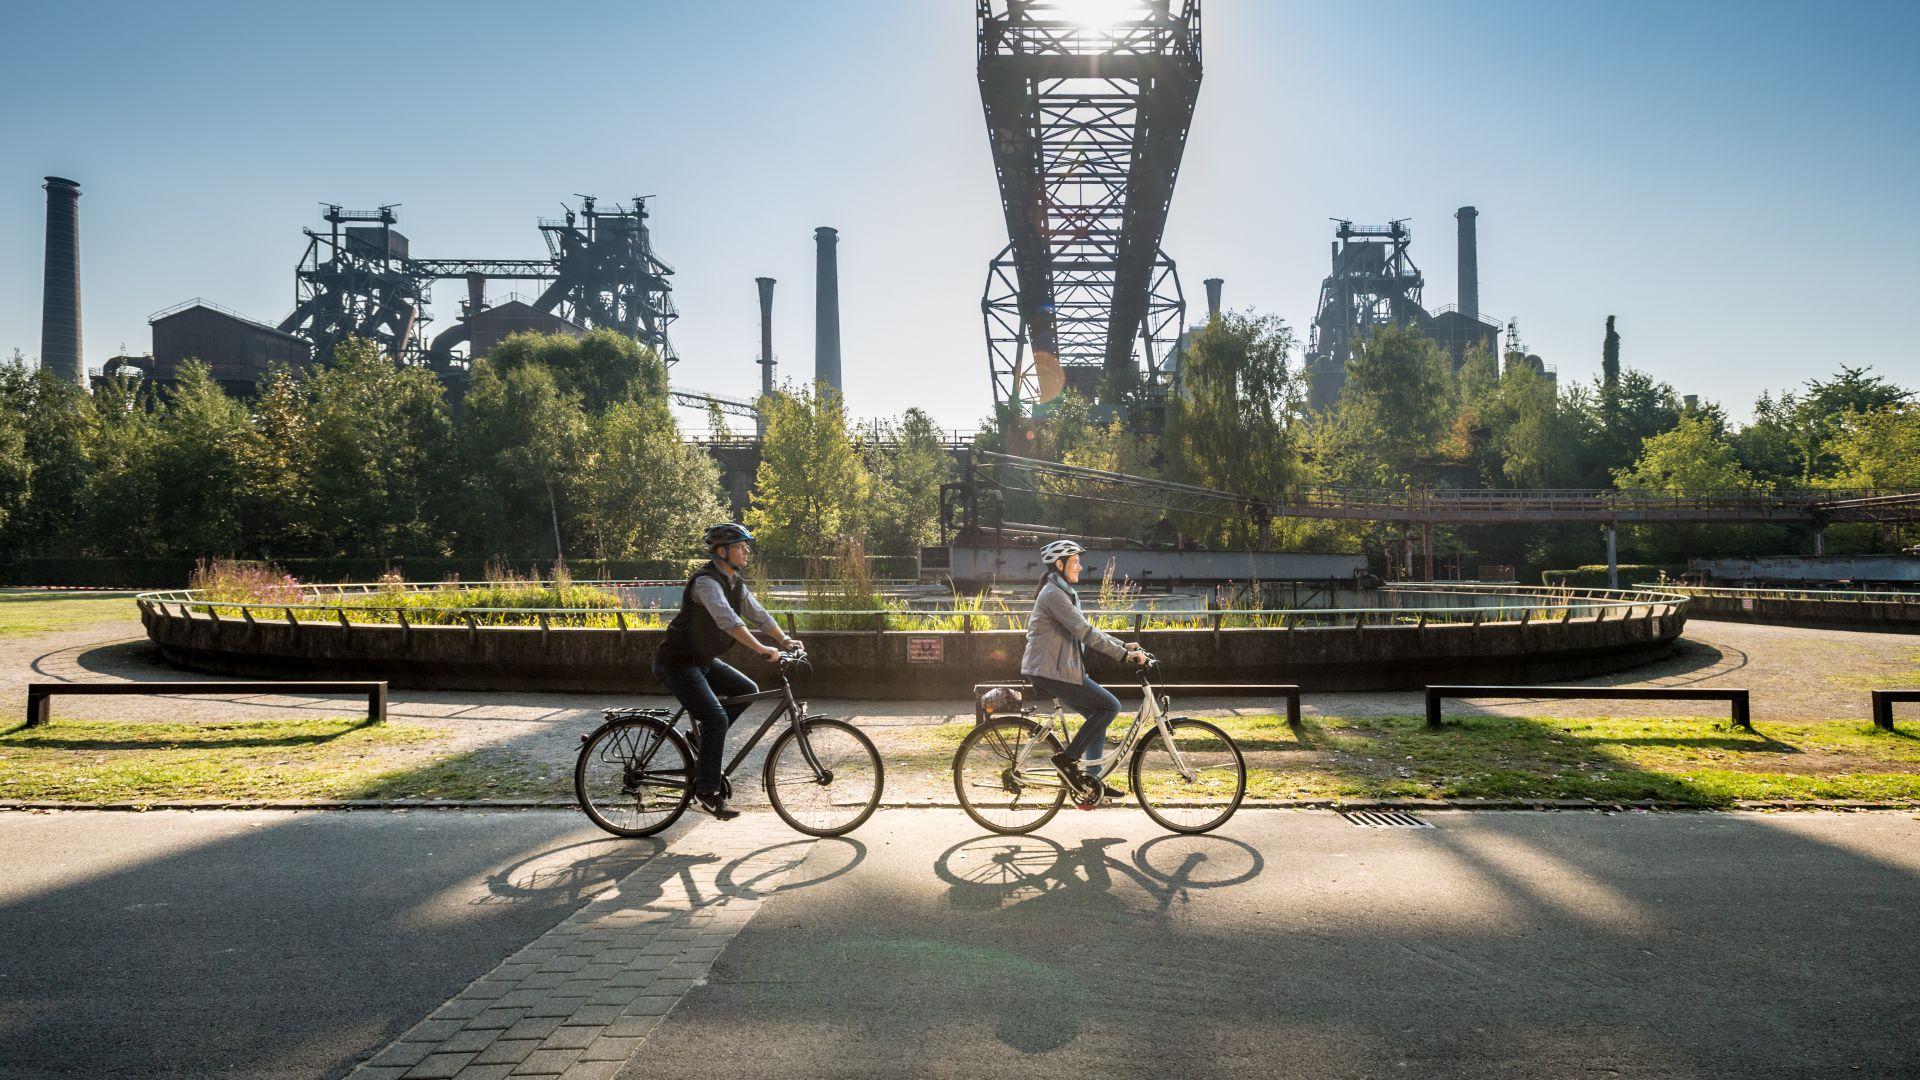 Rheinradweg: cycling in the landscape park Duisburg-Nord